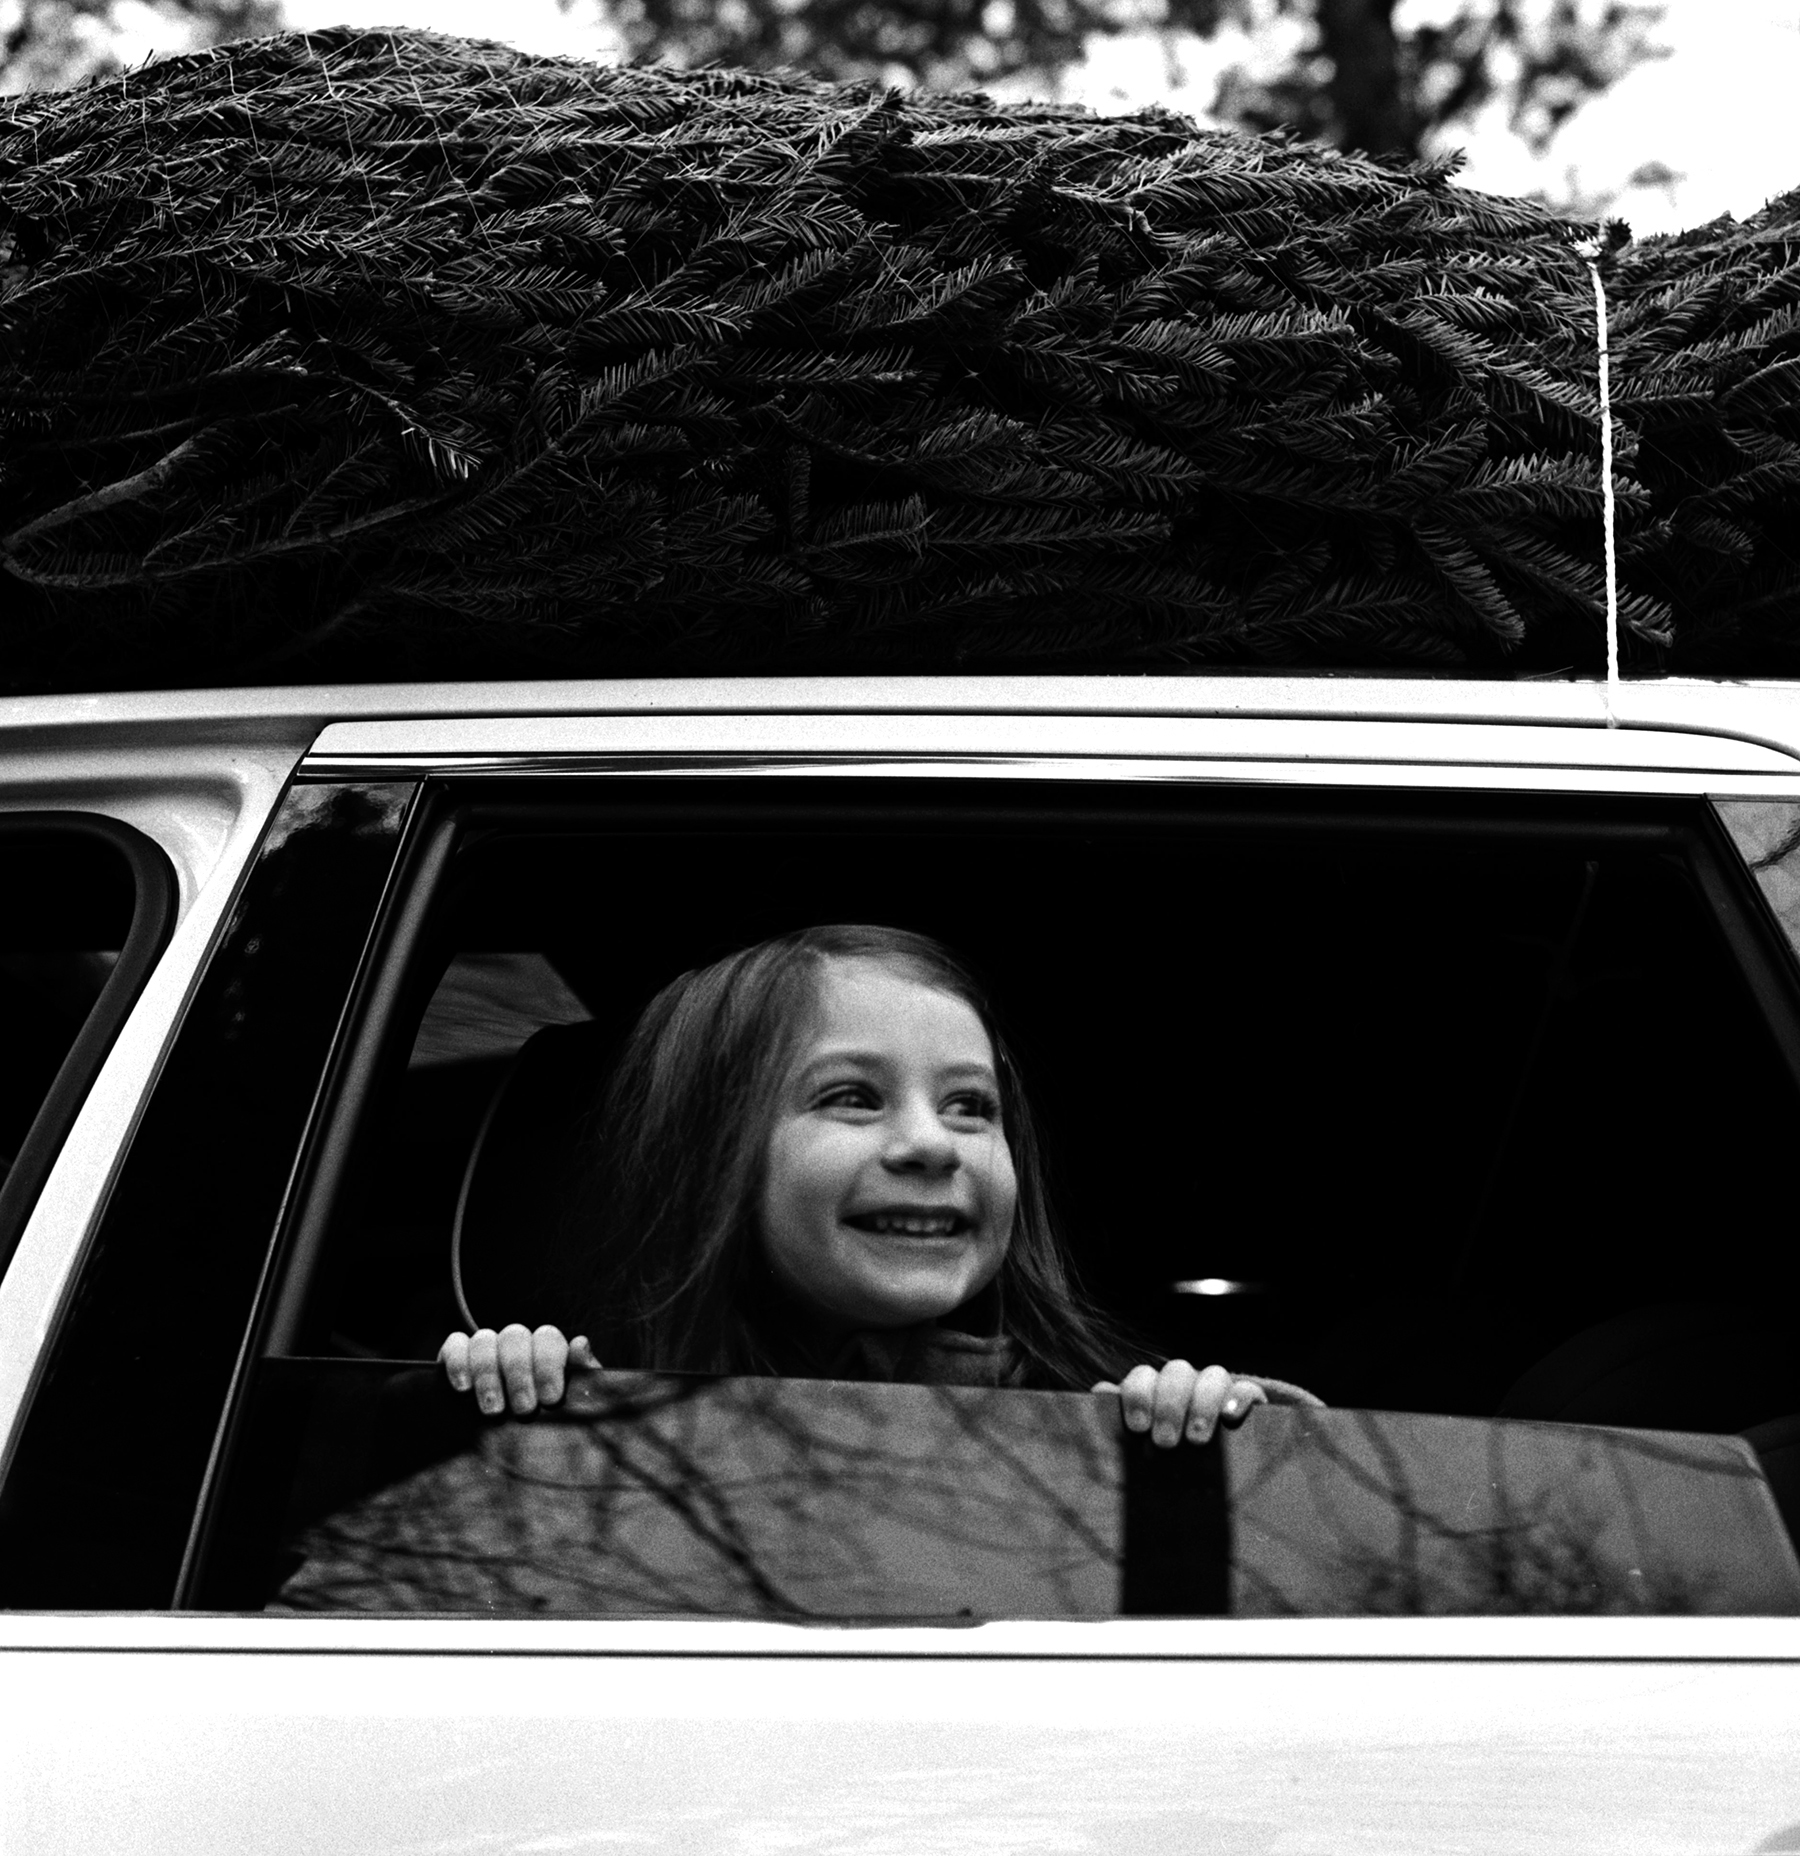 Bringing Home the Tree   Hasselblad 500 CM   Ilford HP5+   Ellen Goodman